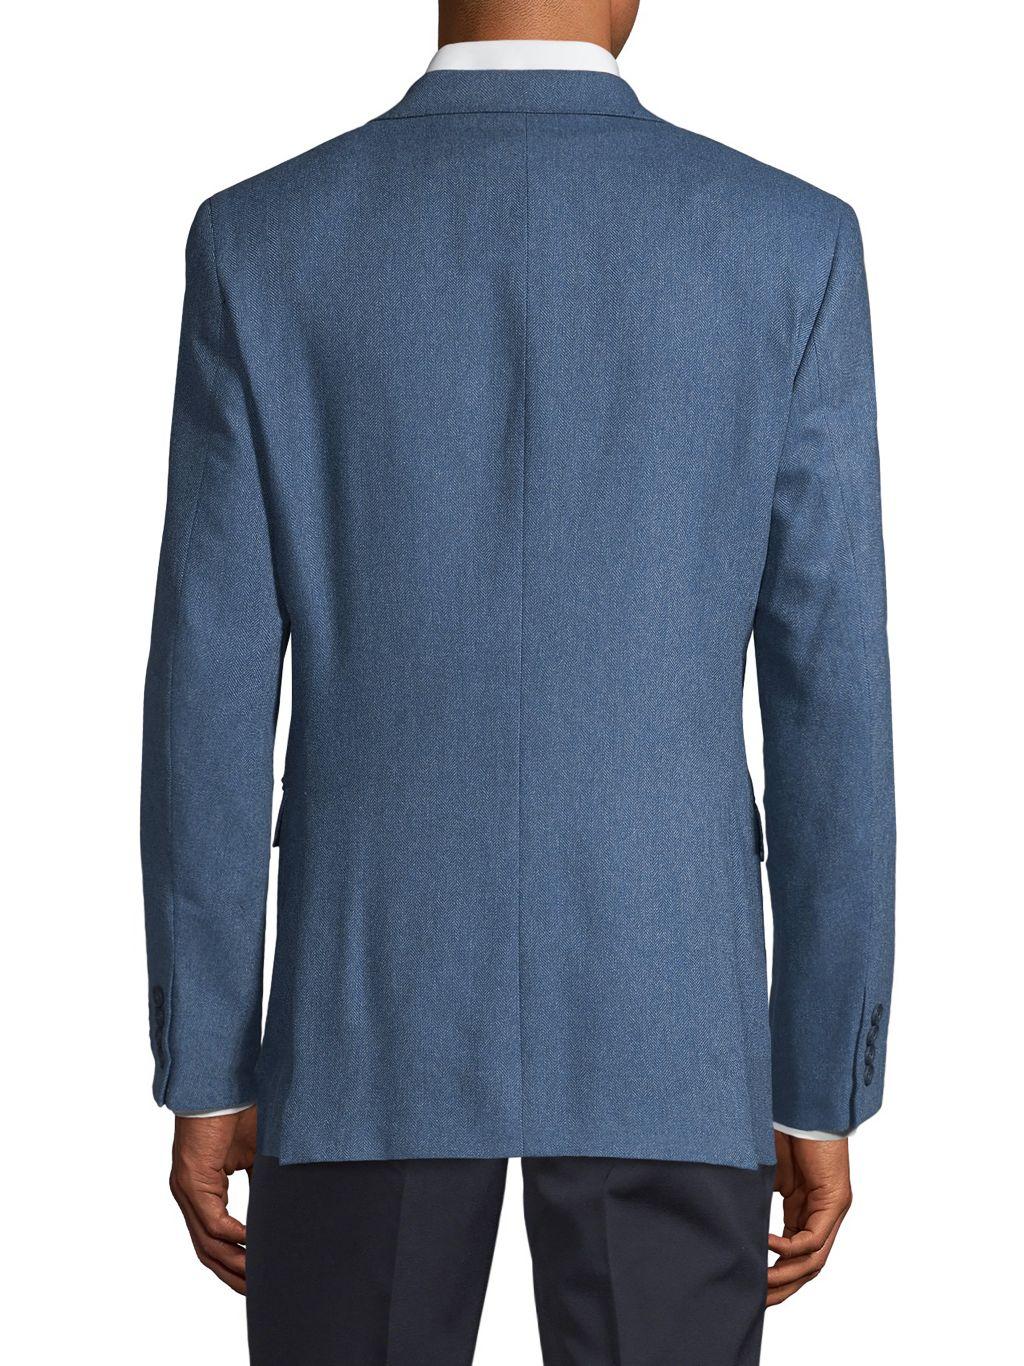 Saks Fifth Avenue Standard-Fit Cashmere Sportcoat